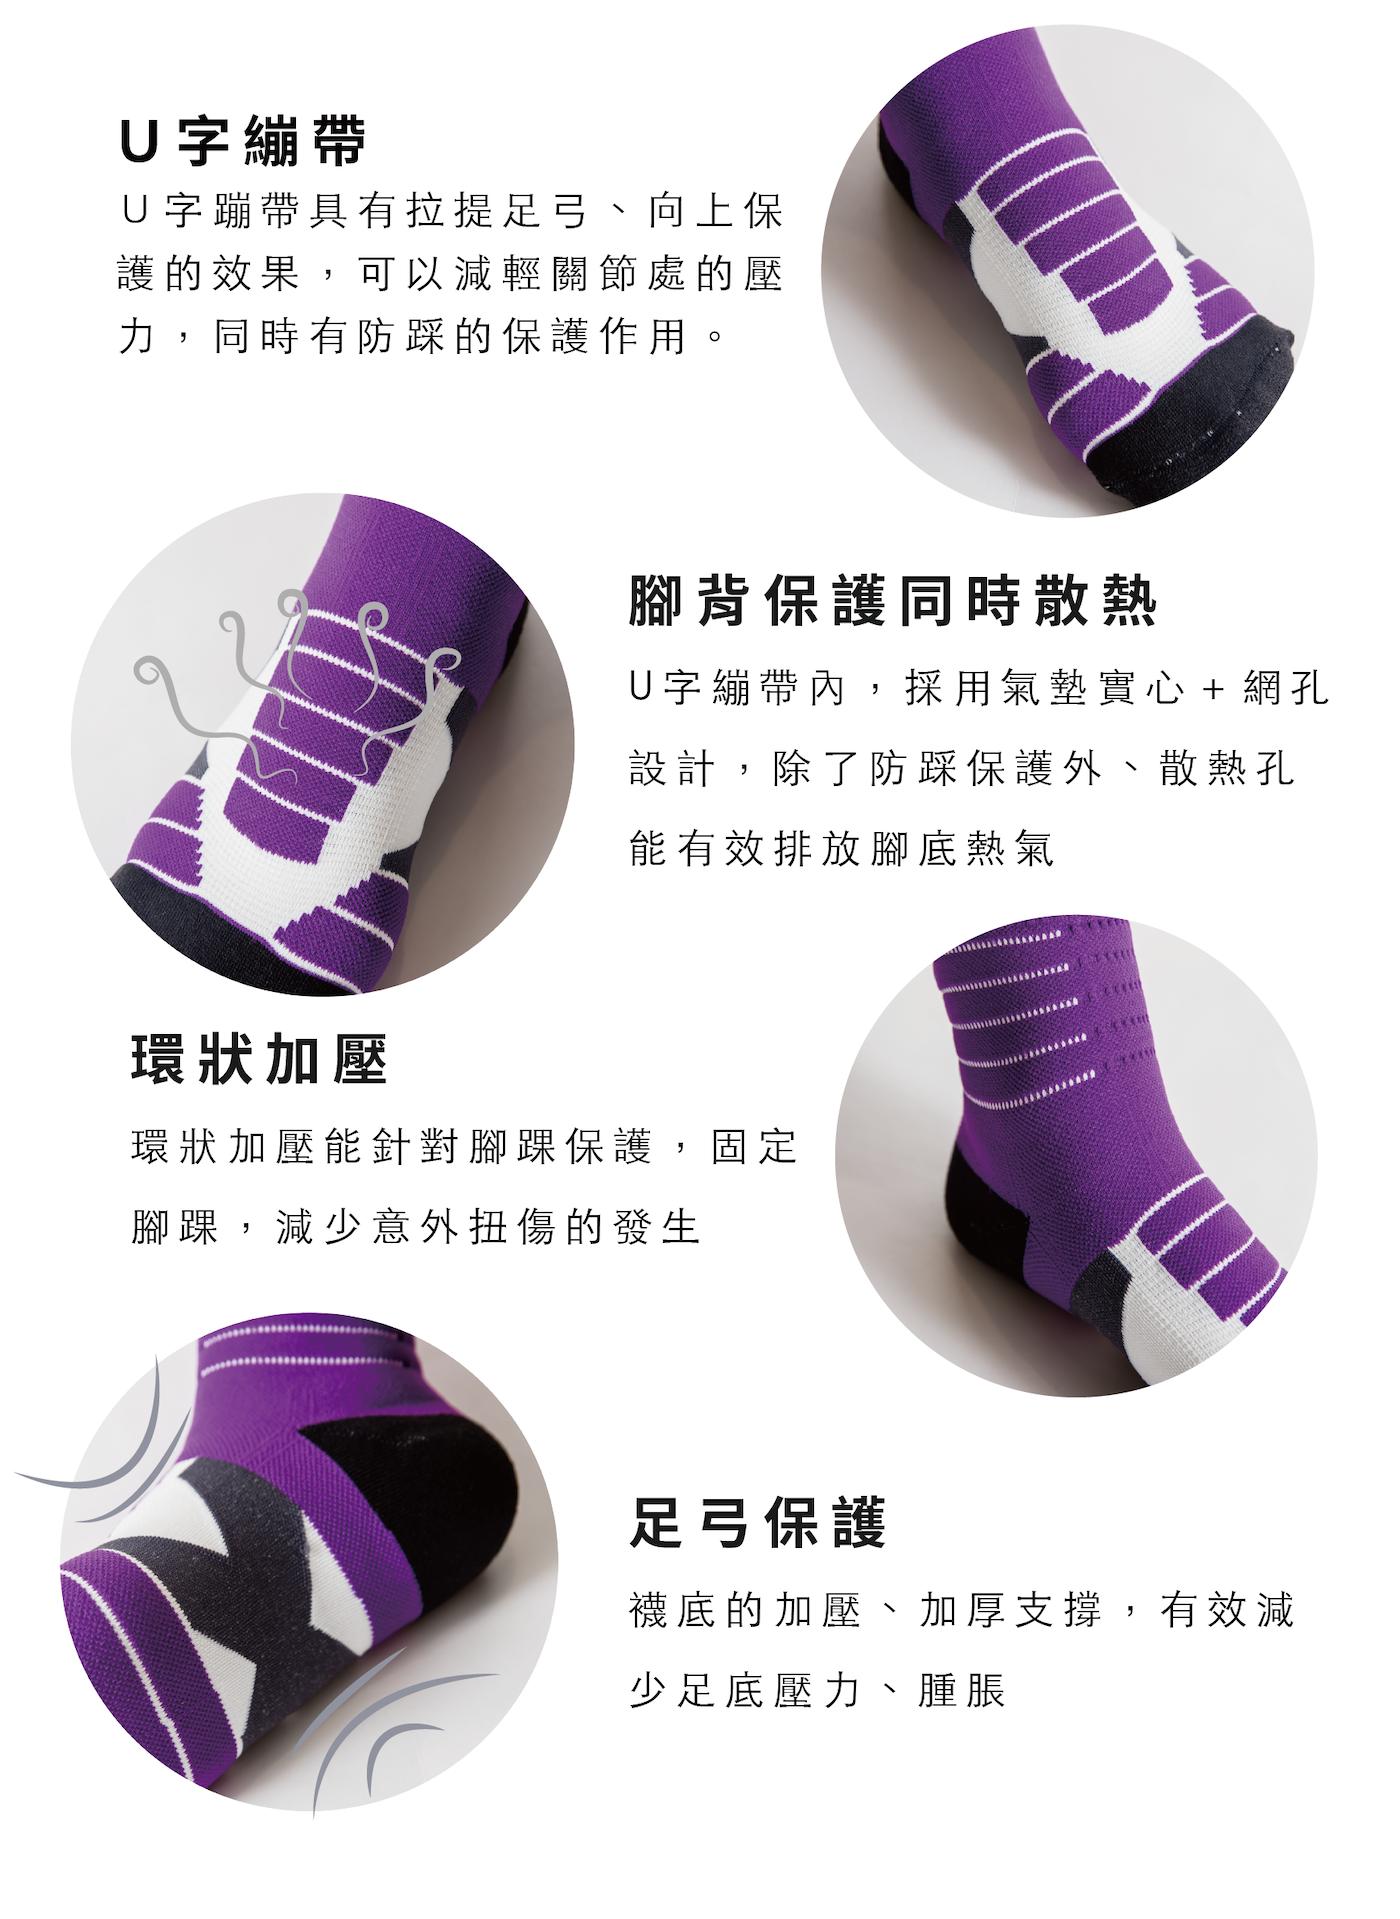 U字繃帶加上環狀繃帶保護腳踝,底部則有x繃帶做足弓支撐